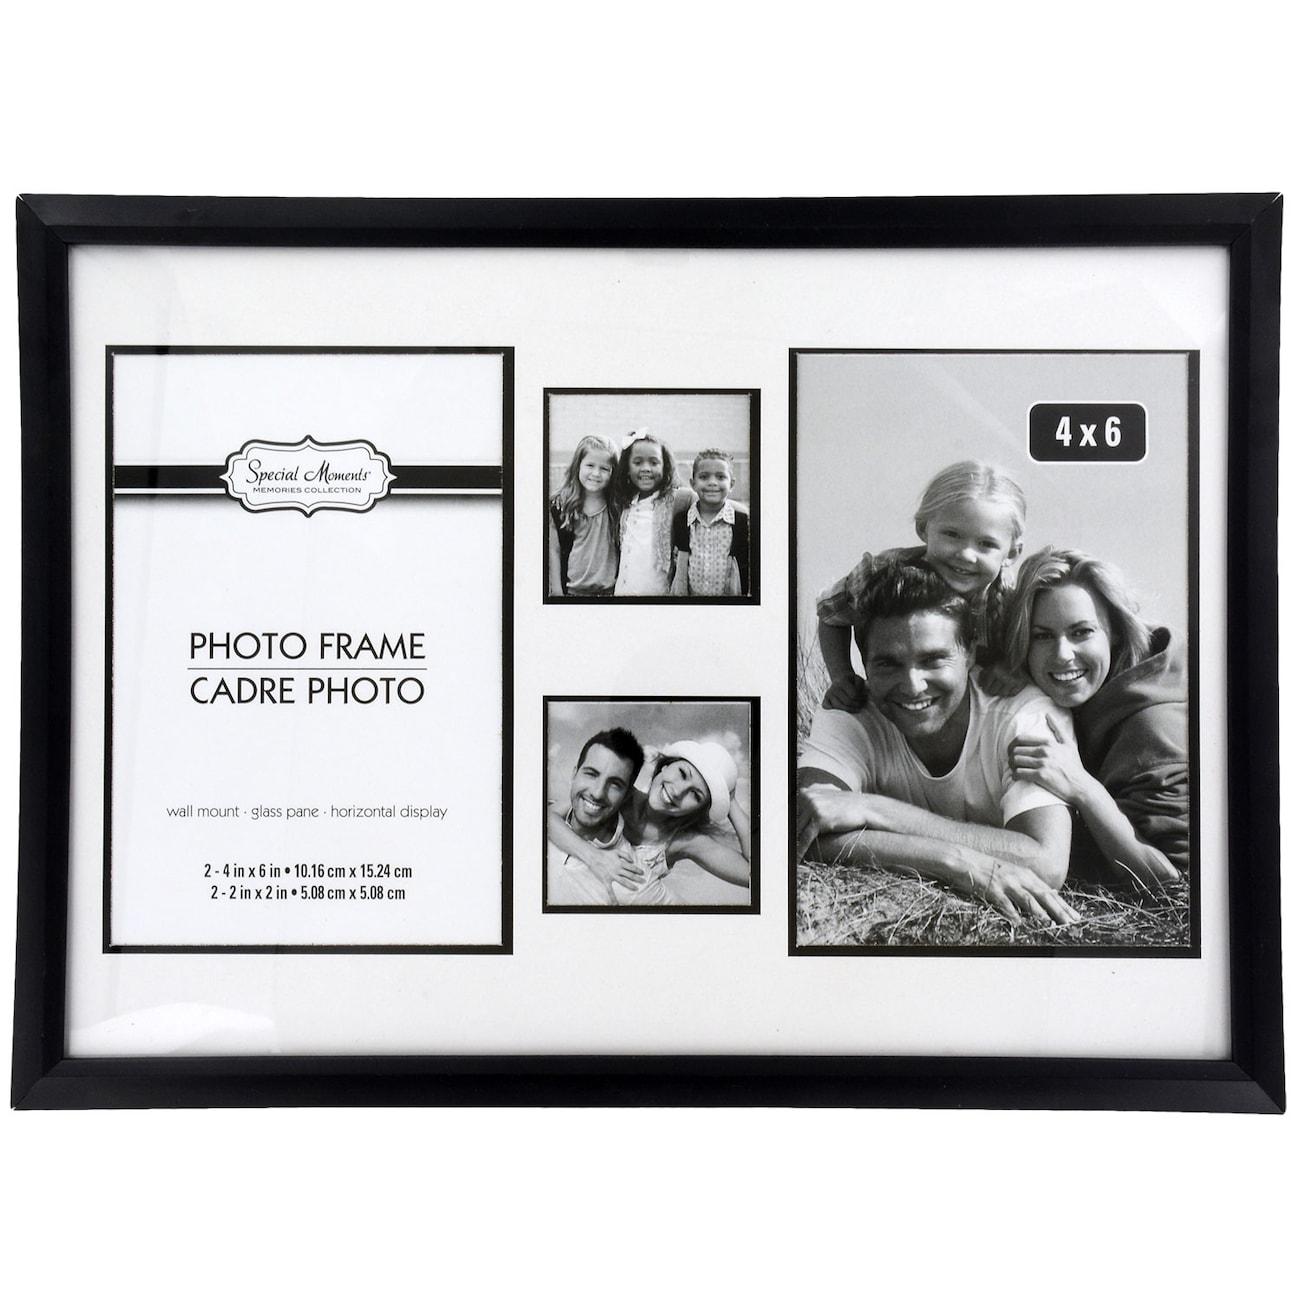 Collage Frames - Dollar Tree, Inc.